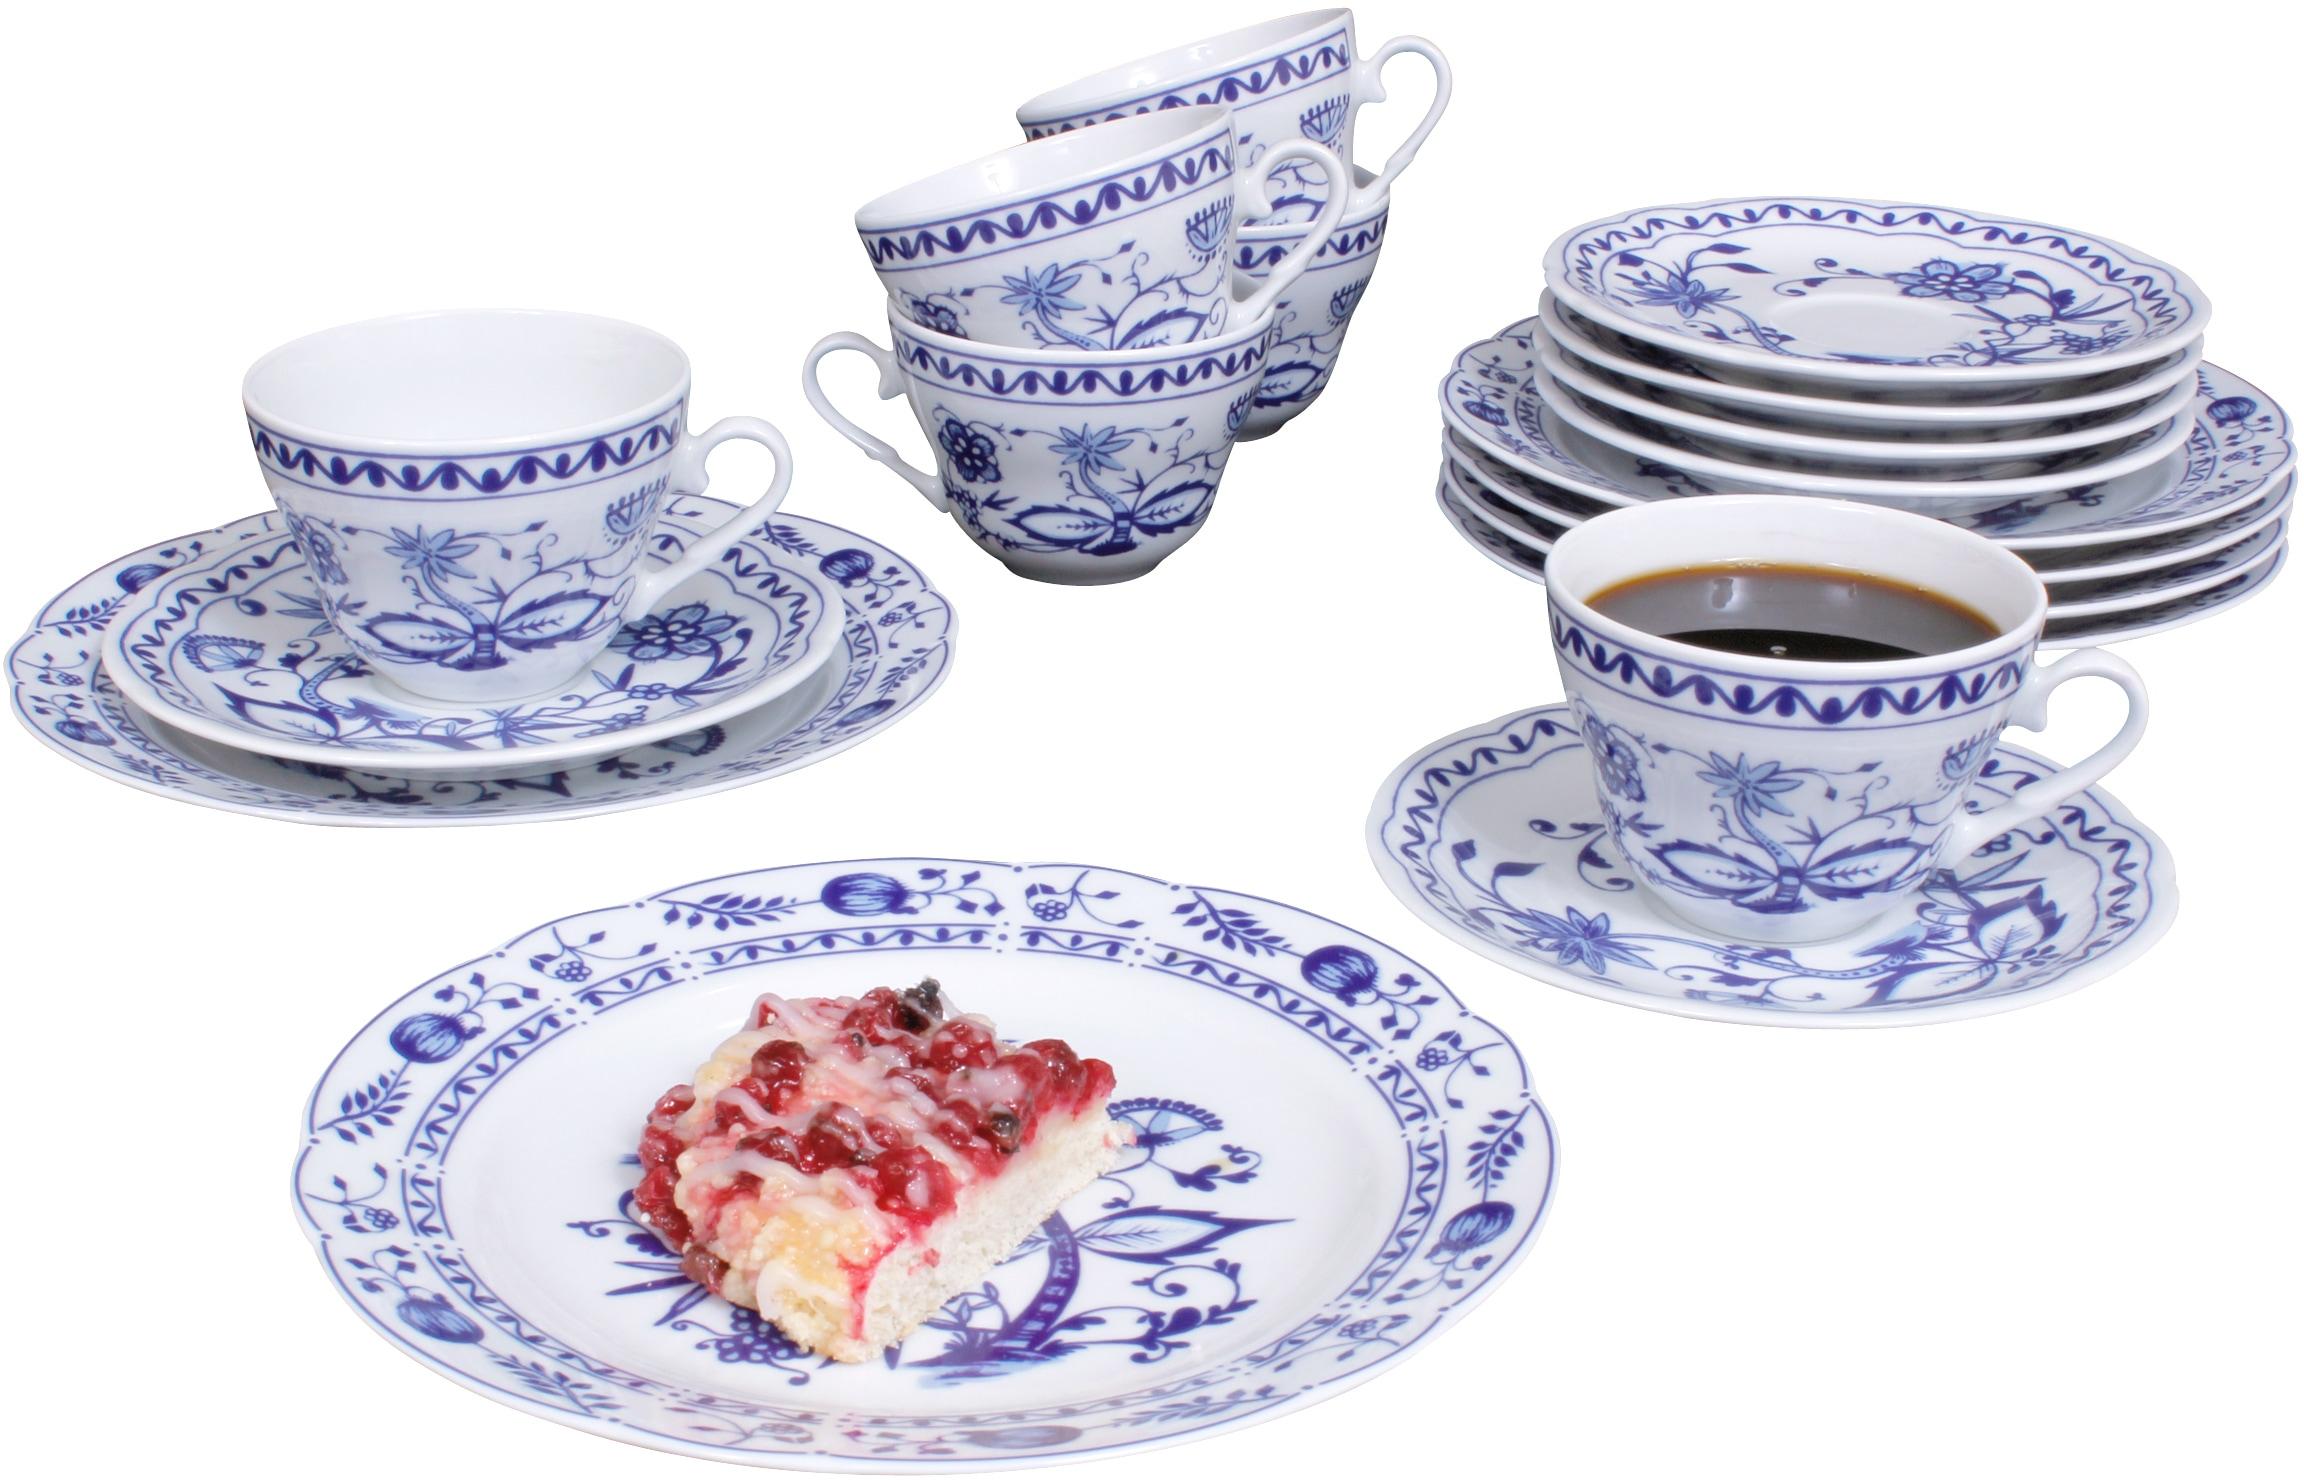 Eschenbach Kaffeeservice Romantika - Zwiebelmuster, (18 tlg.), Made in Germany weiß Geschirr-Sets Geschirr, Porzellan Tischaccessoires Haushaltswaren